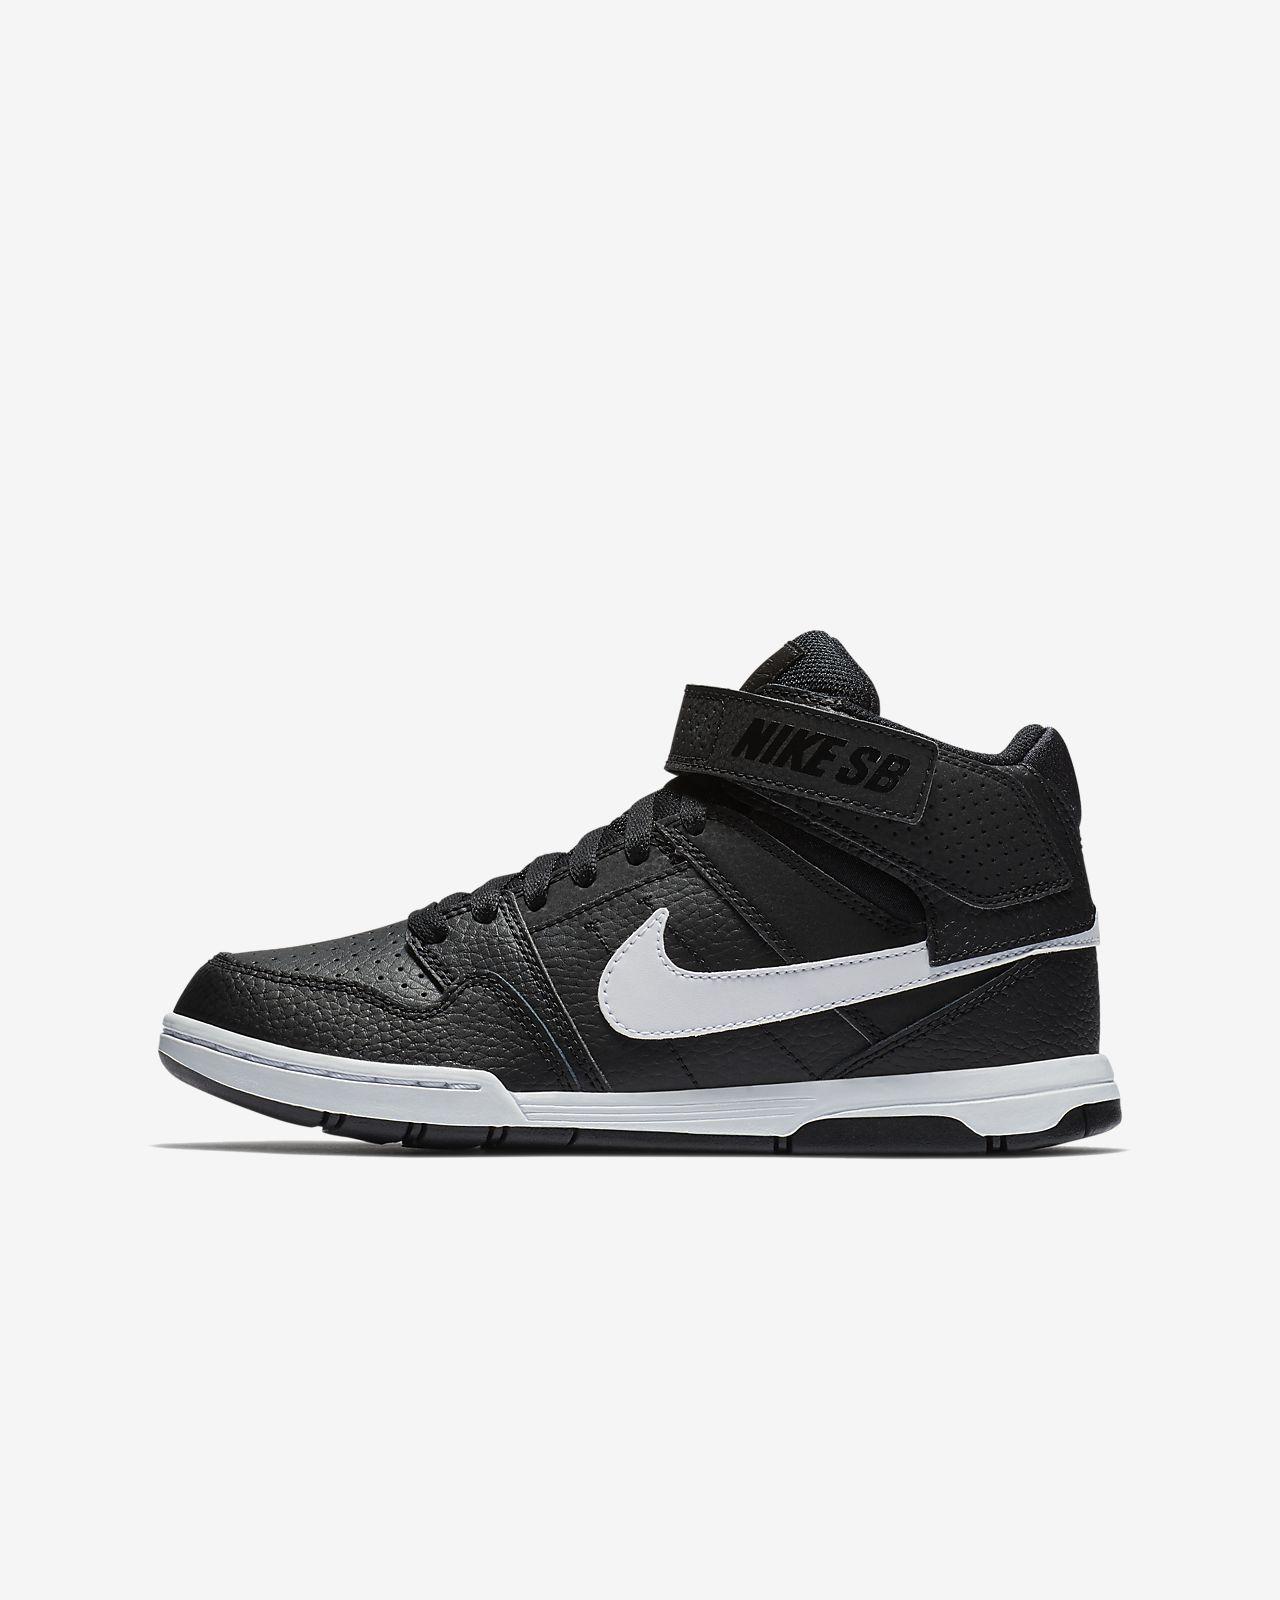 Nike Son of Force Mid Női sportcipő, FeketeFehér, 38.5